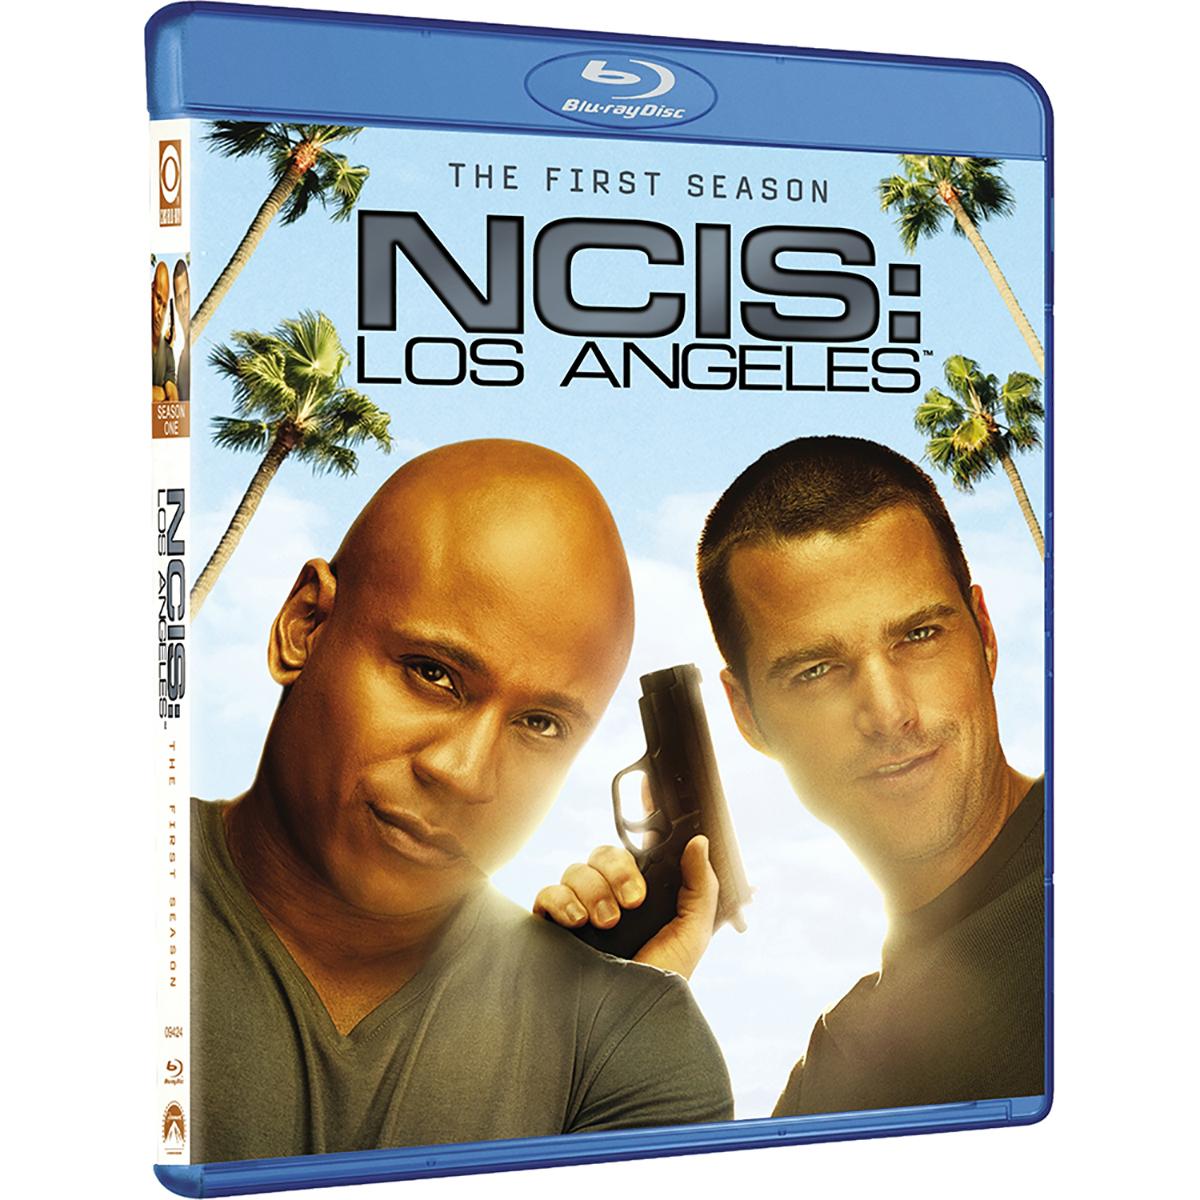 NCIS: Los Angeles - Season 1 Blu-ray -  DVDs & Videos 4308-267762